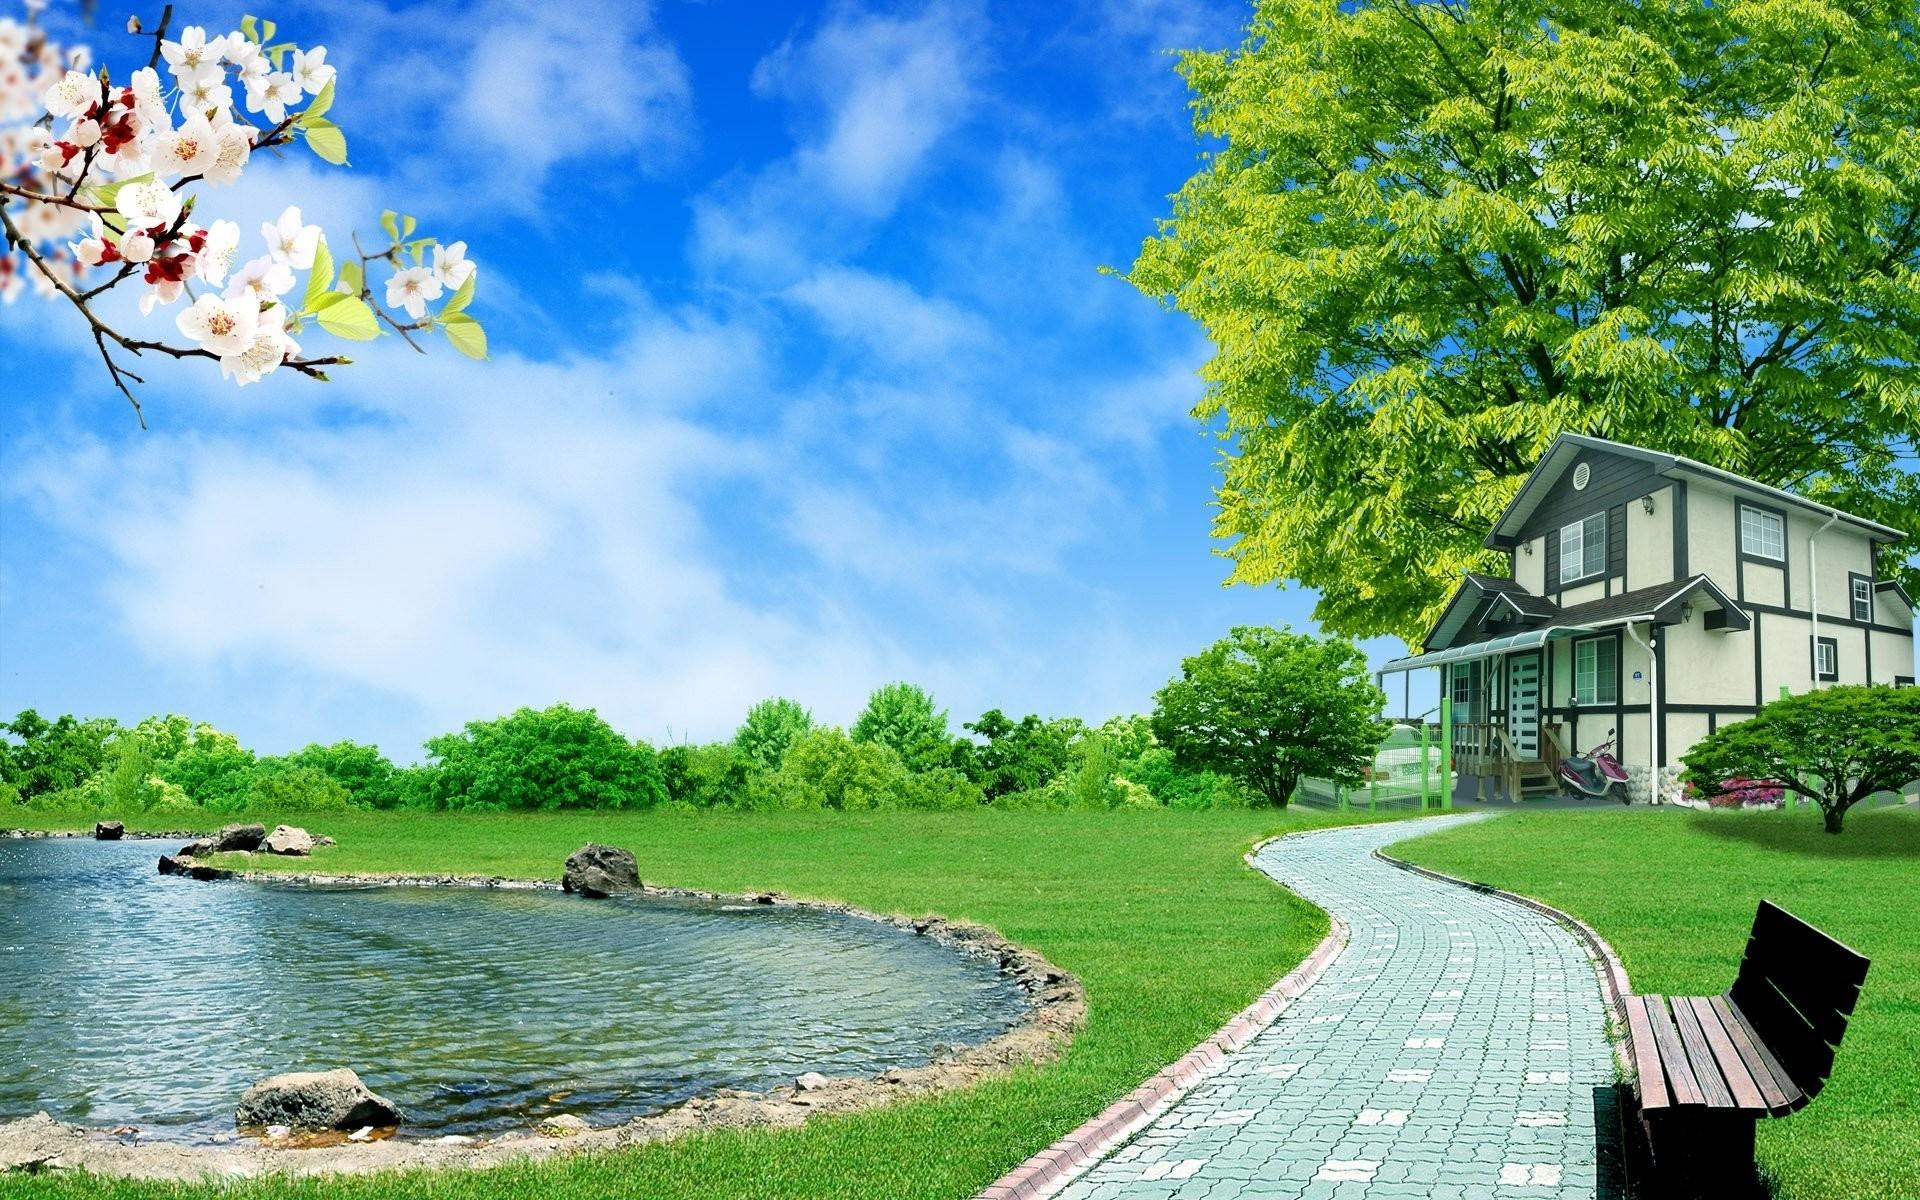 10 Most Popular 3d Wallpaper Hd 1080p Free Download Full: 10 Top 3D Nature Wallpapers For Desktop Free Download FULL